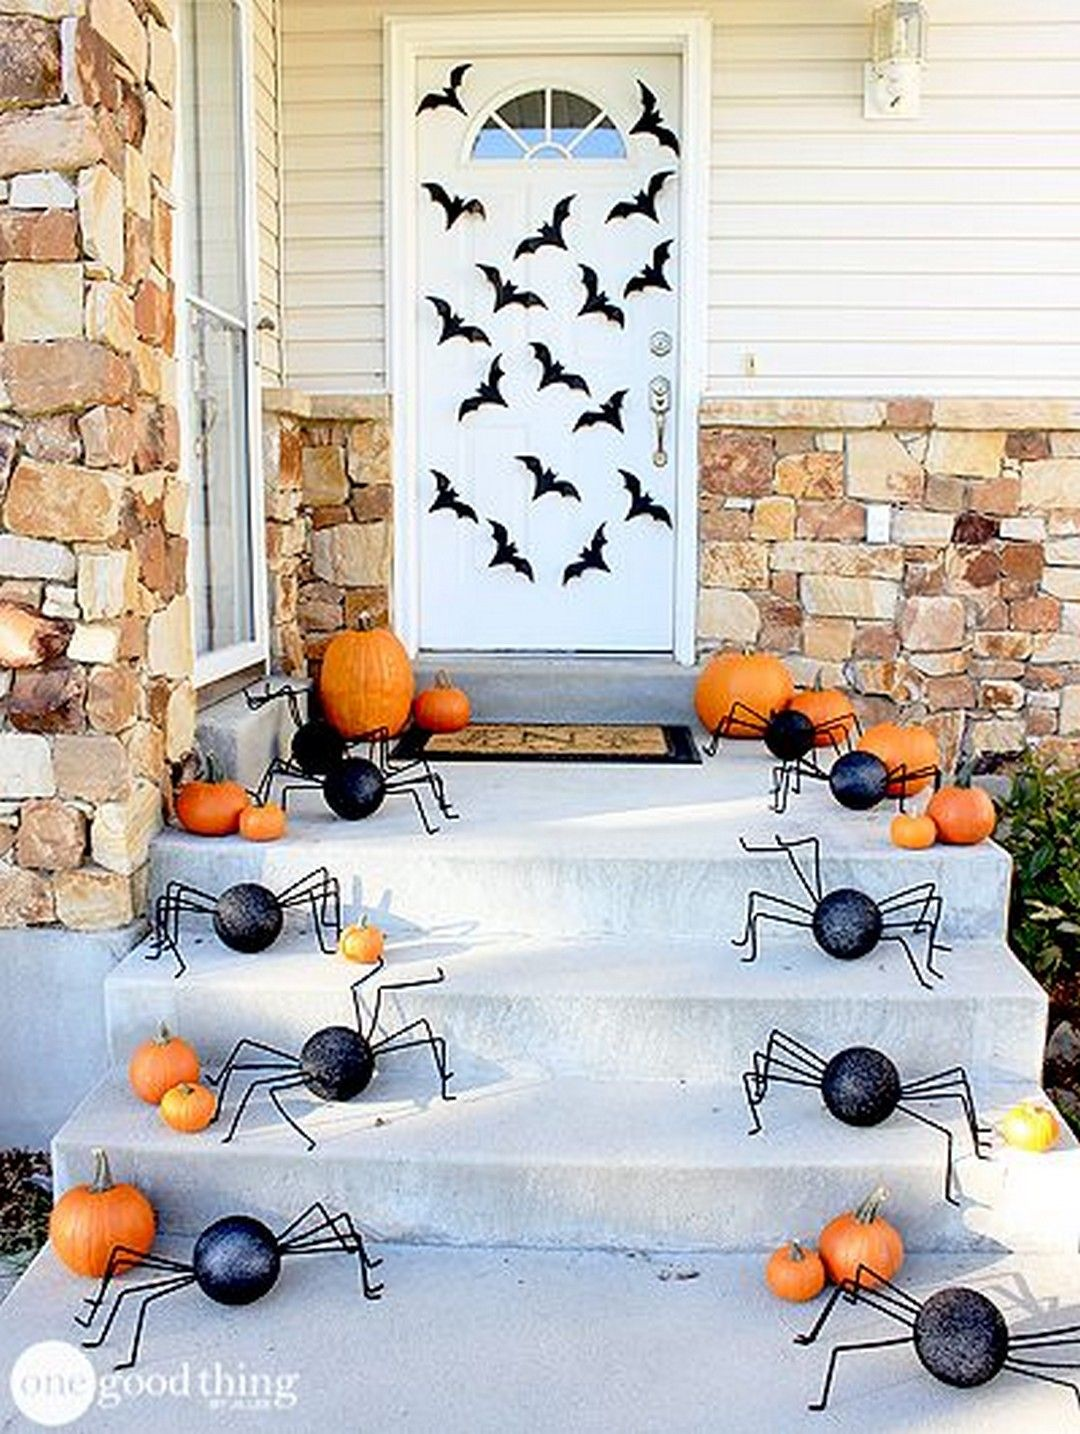 Find more indoor and outdoor easy DIY